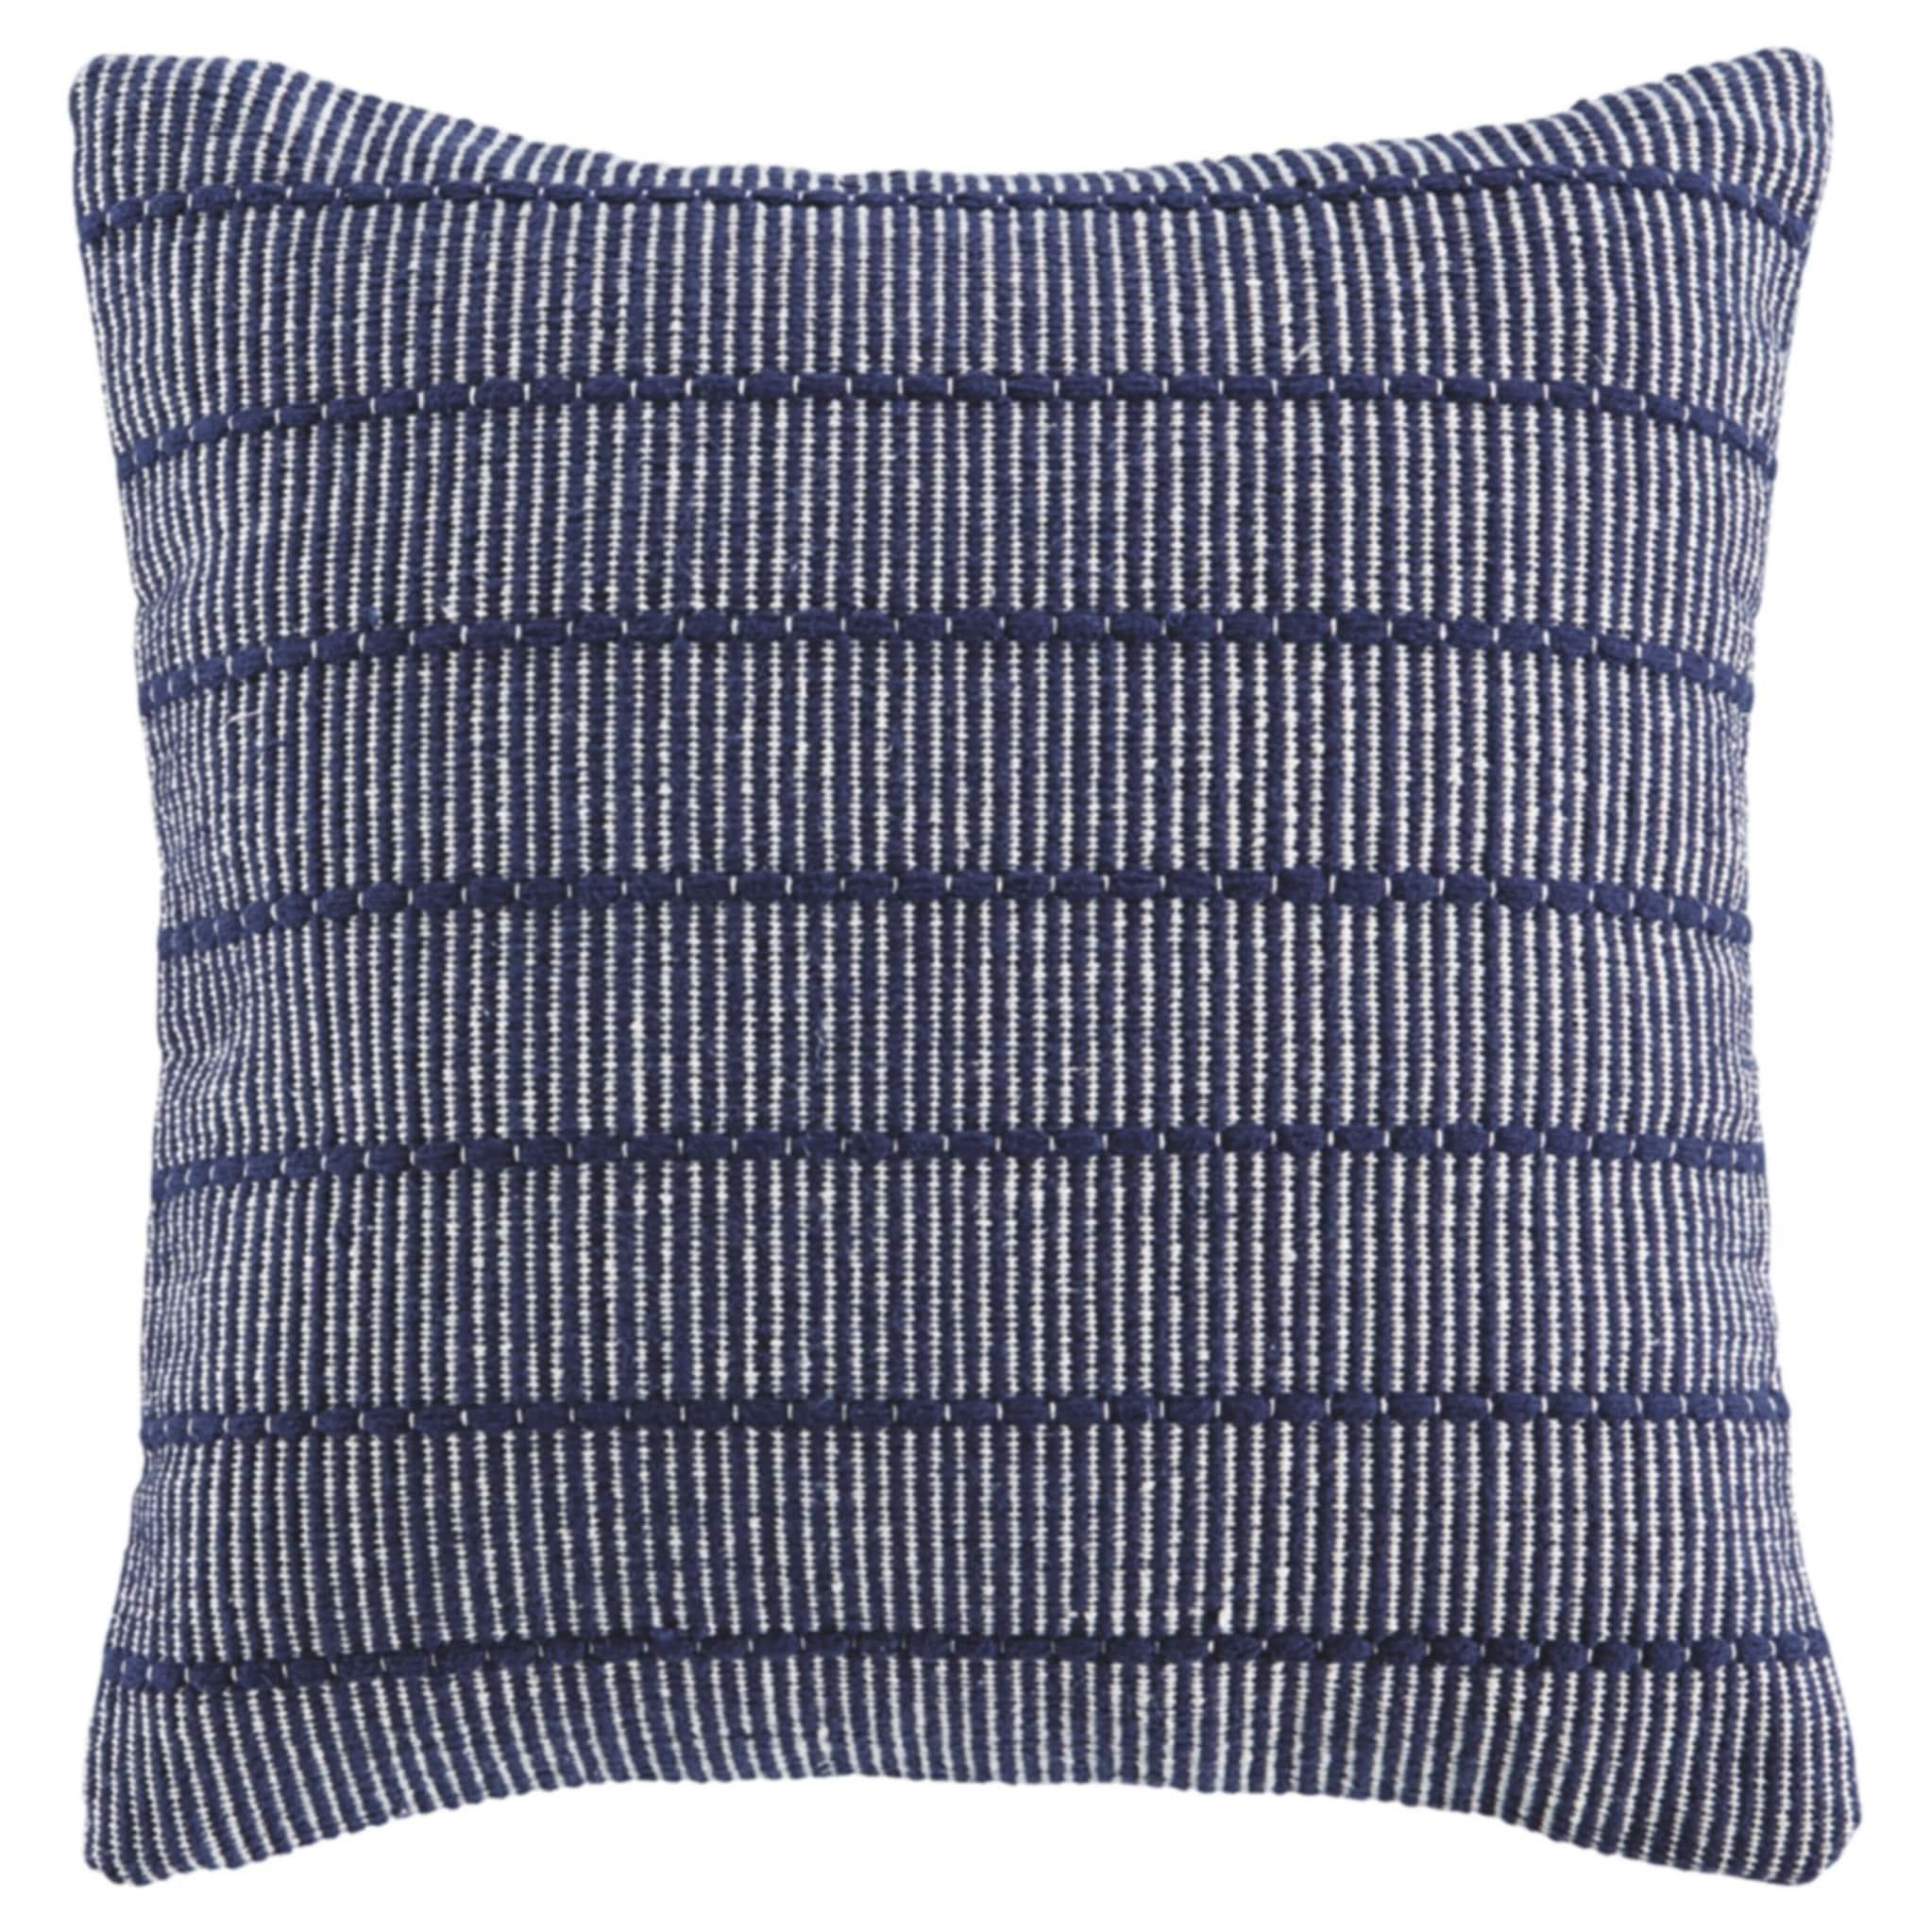 Shop Porch Den Rhodora Navy Blue Striped Throw Pillow On Sale Overstock 27871225